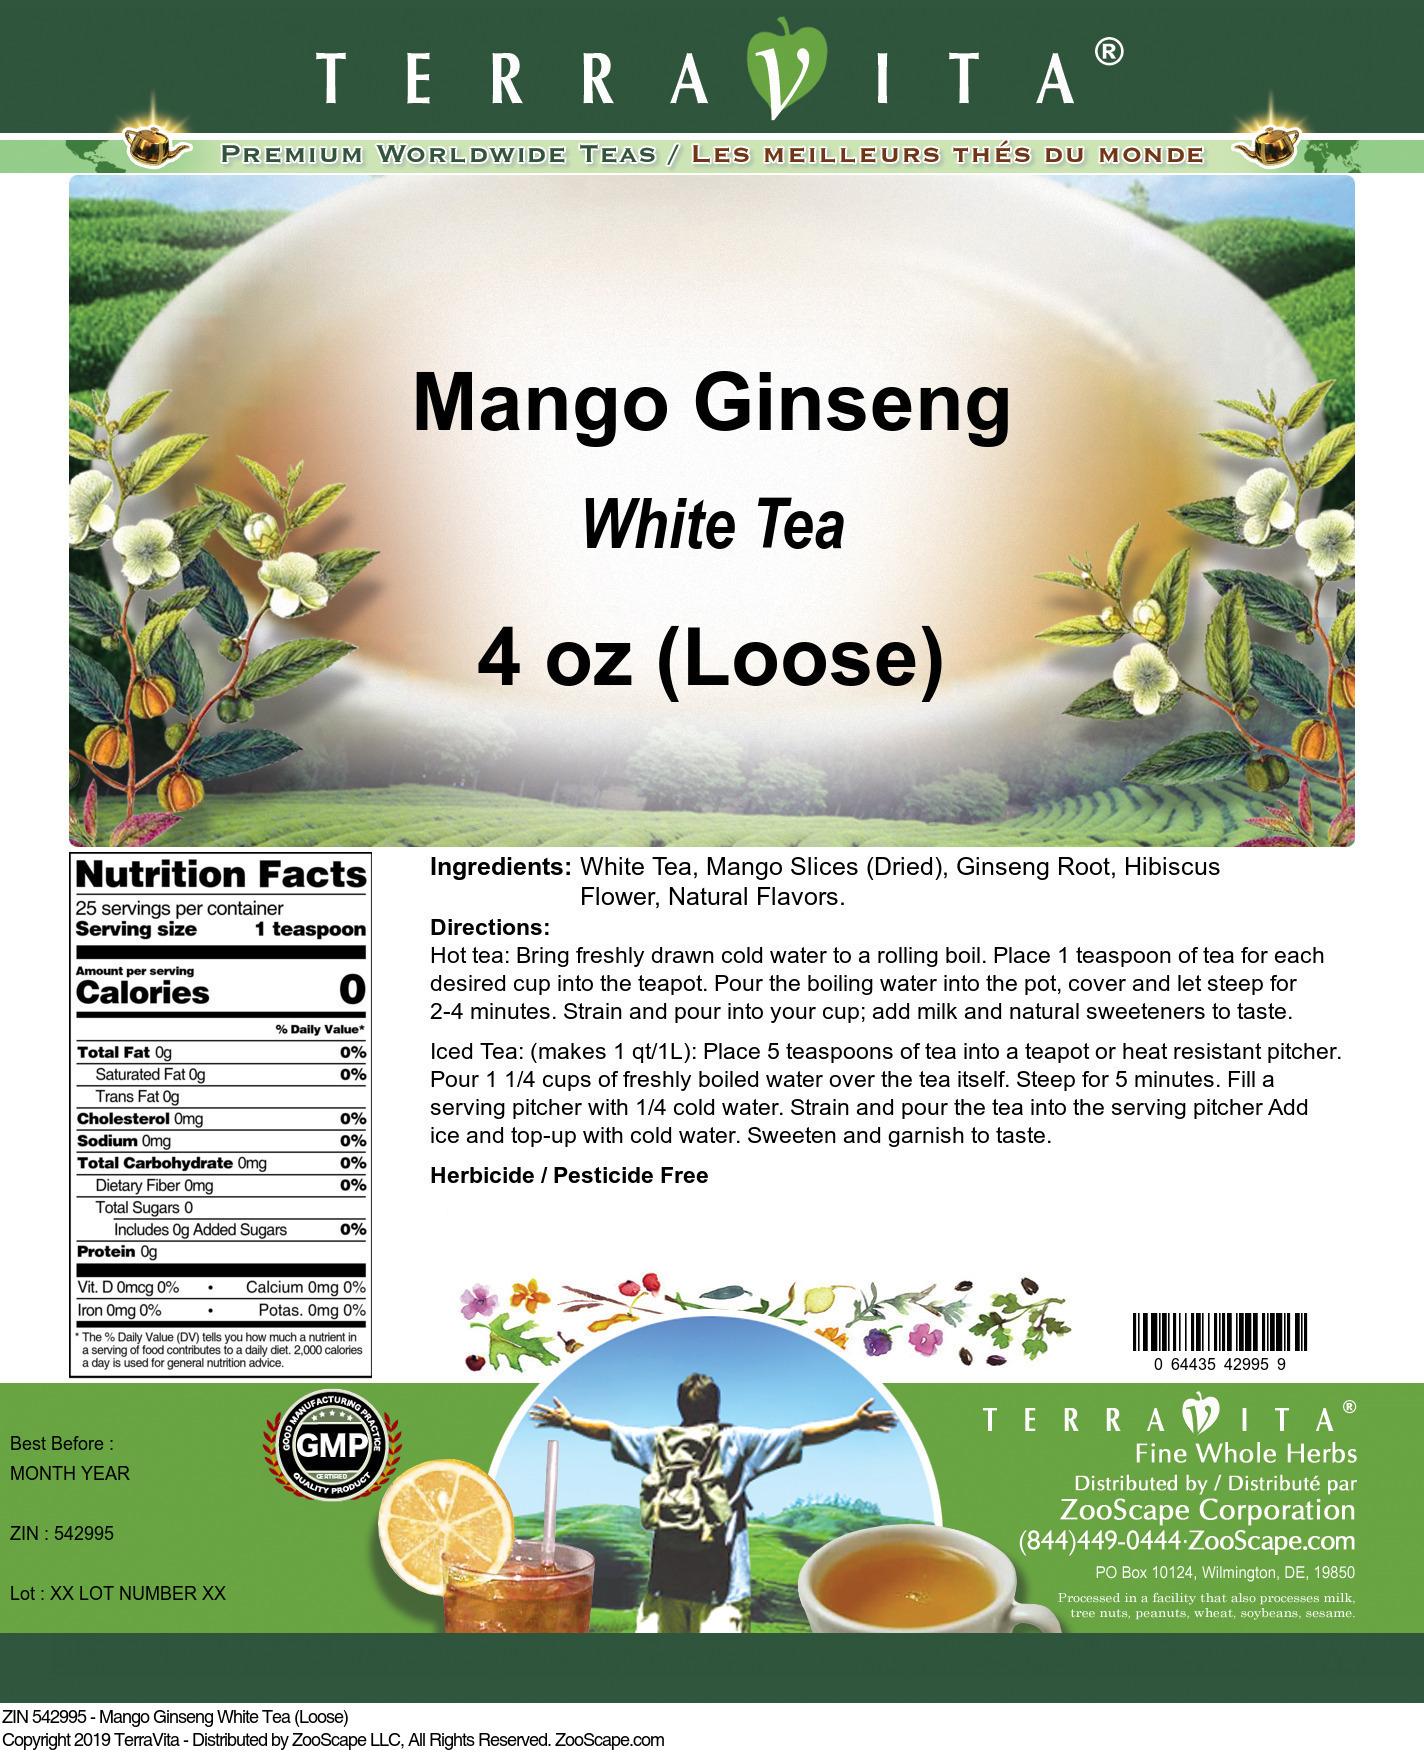 Mango Ginseng White Tea